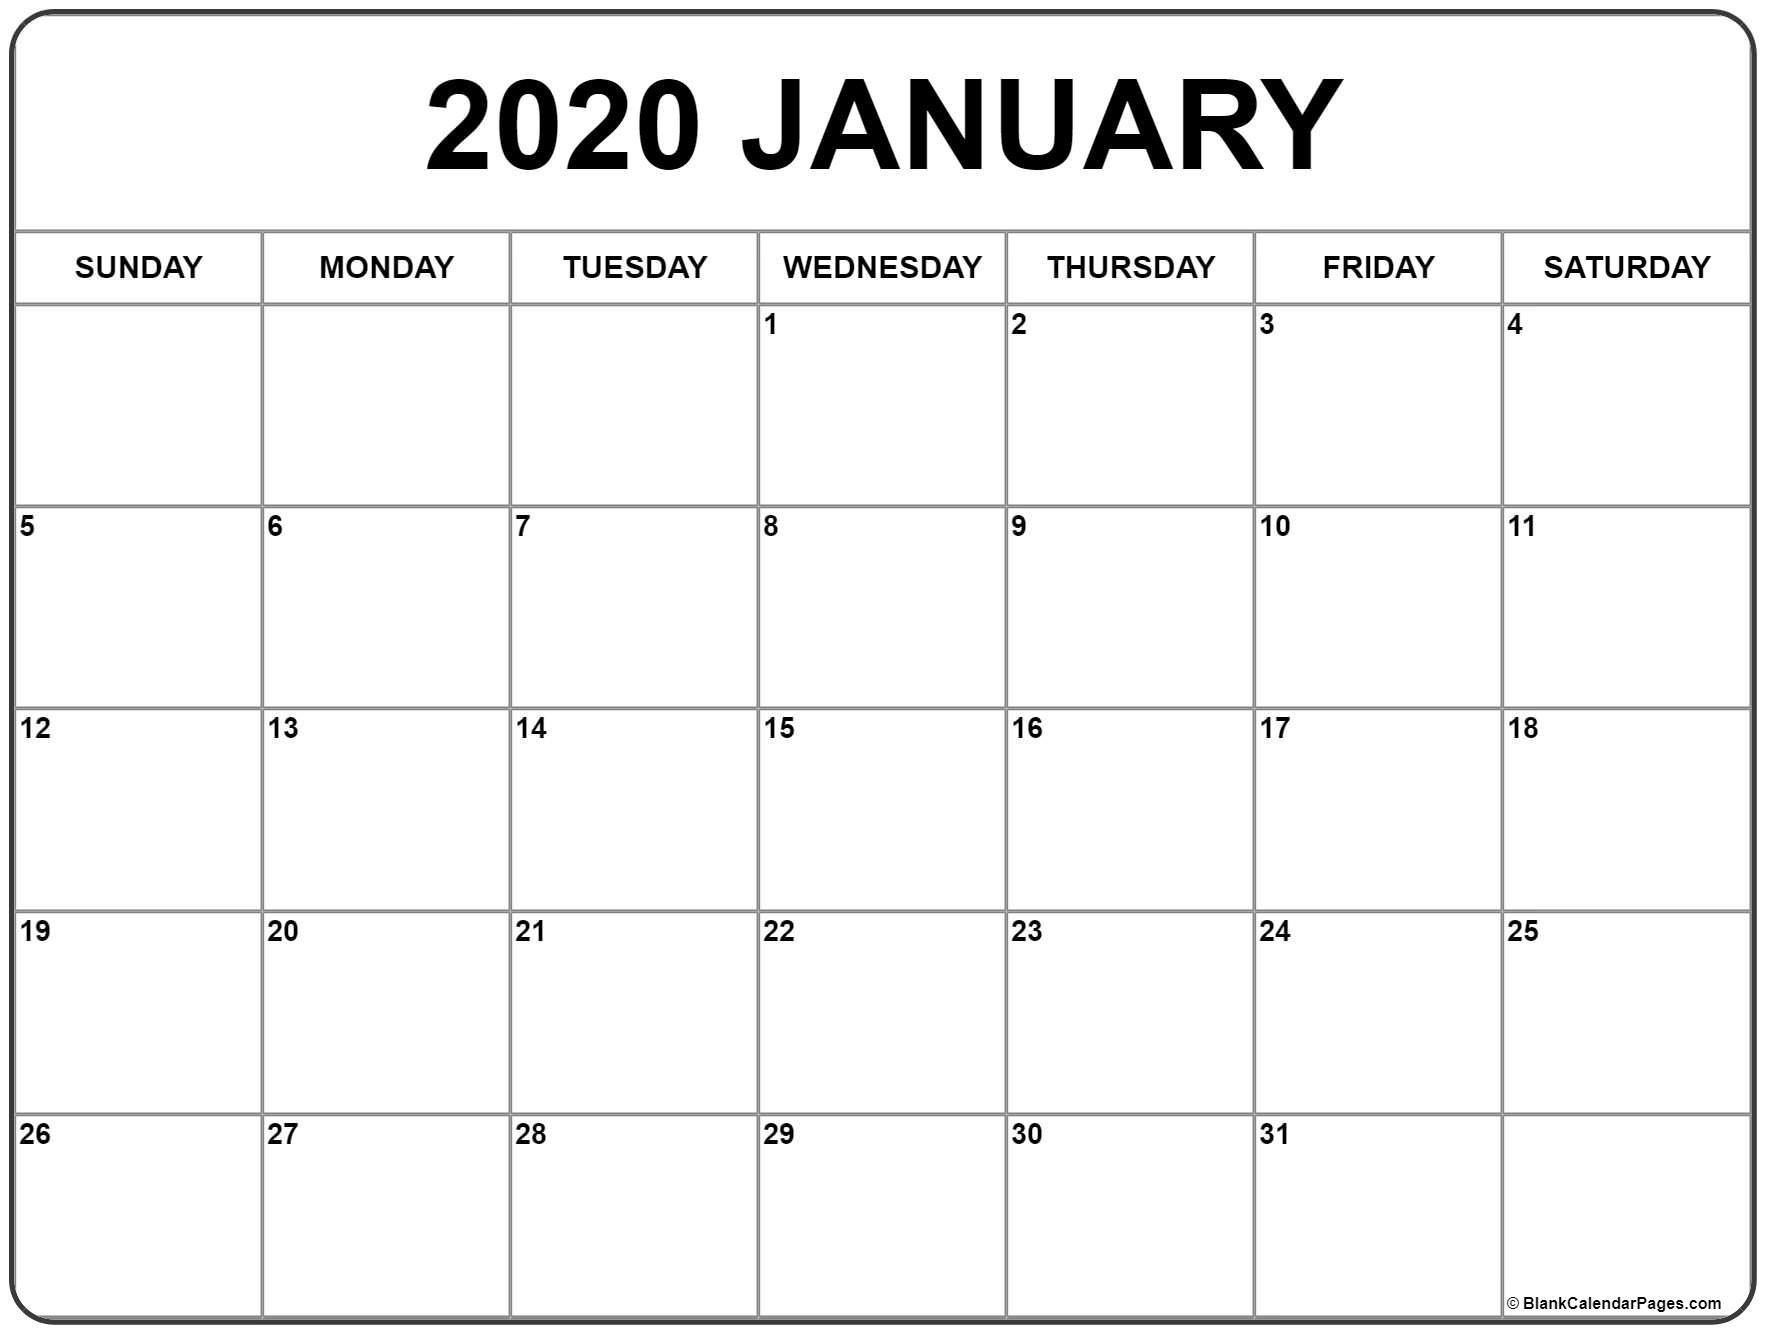 January 2020 Calendar | Free Printable Monthly Calendars-January 2020 Calendar Template Word